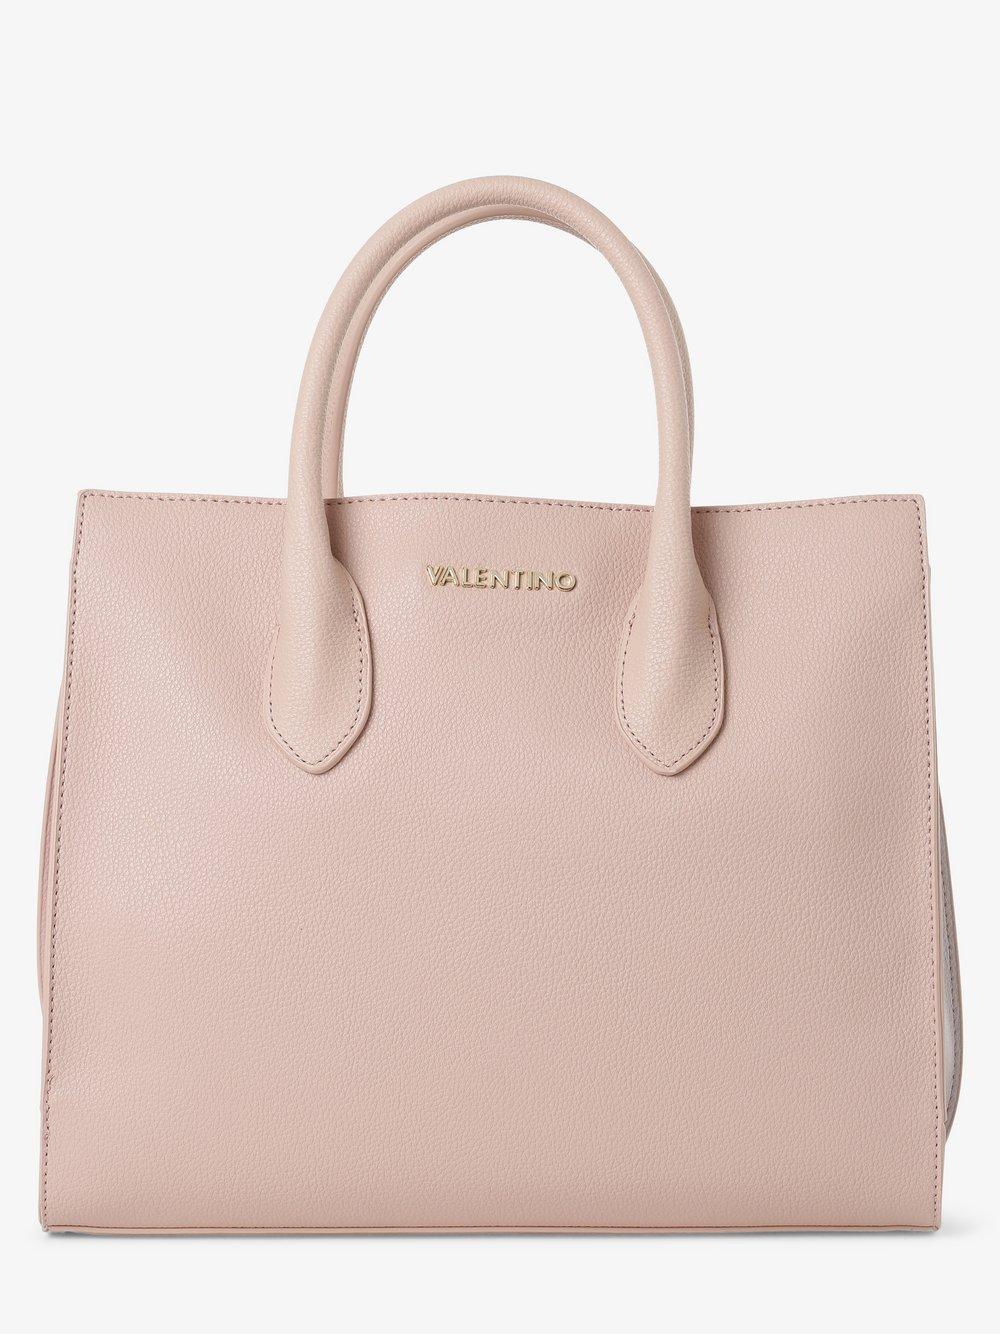 VALENTINO HANDBAGS - Torebka damska z torebką wewnętrzną, różowy Valentino Handbags